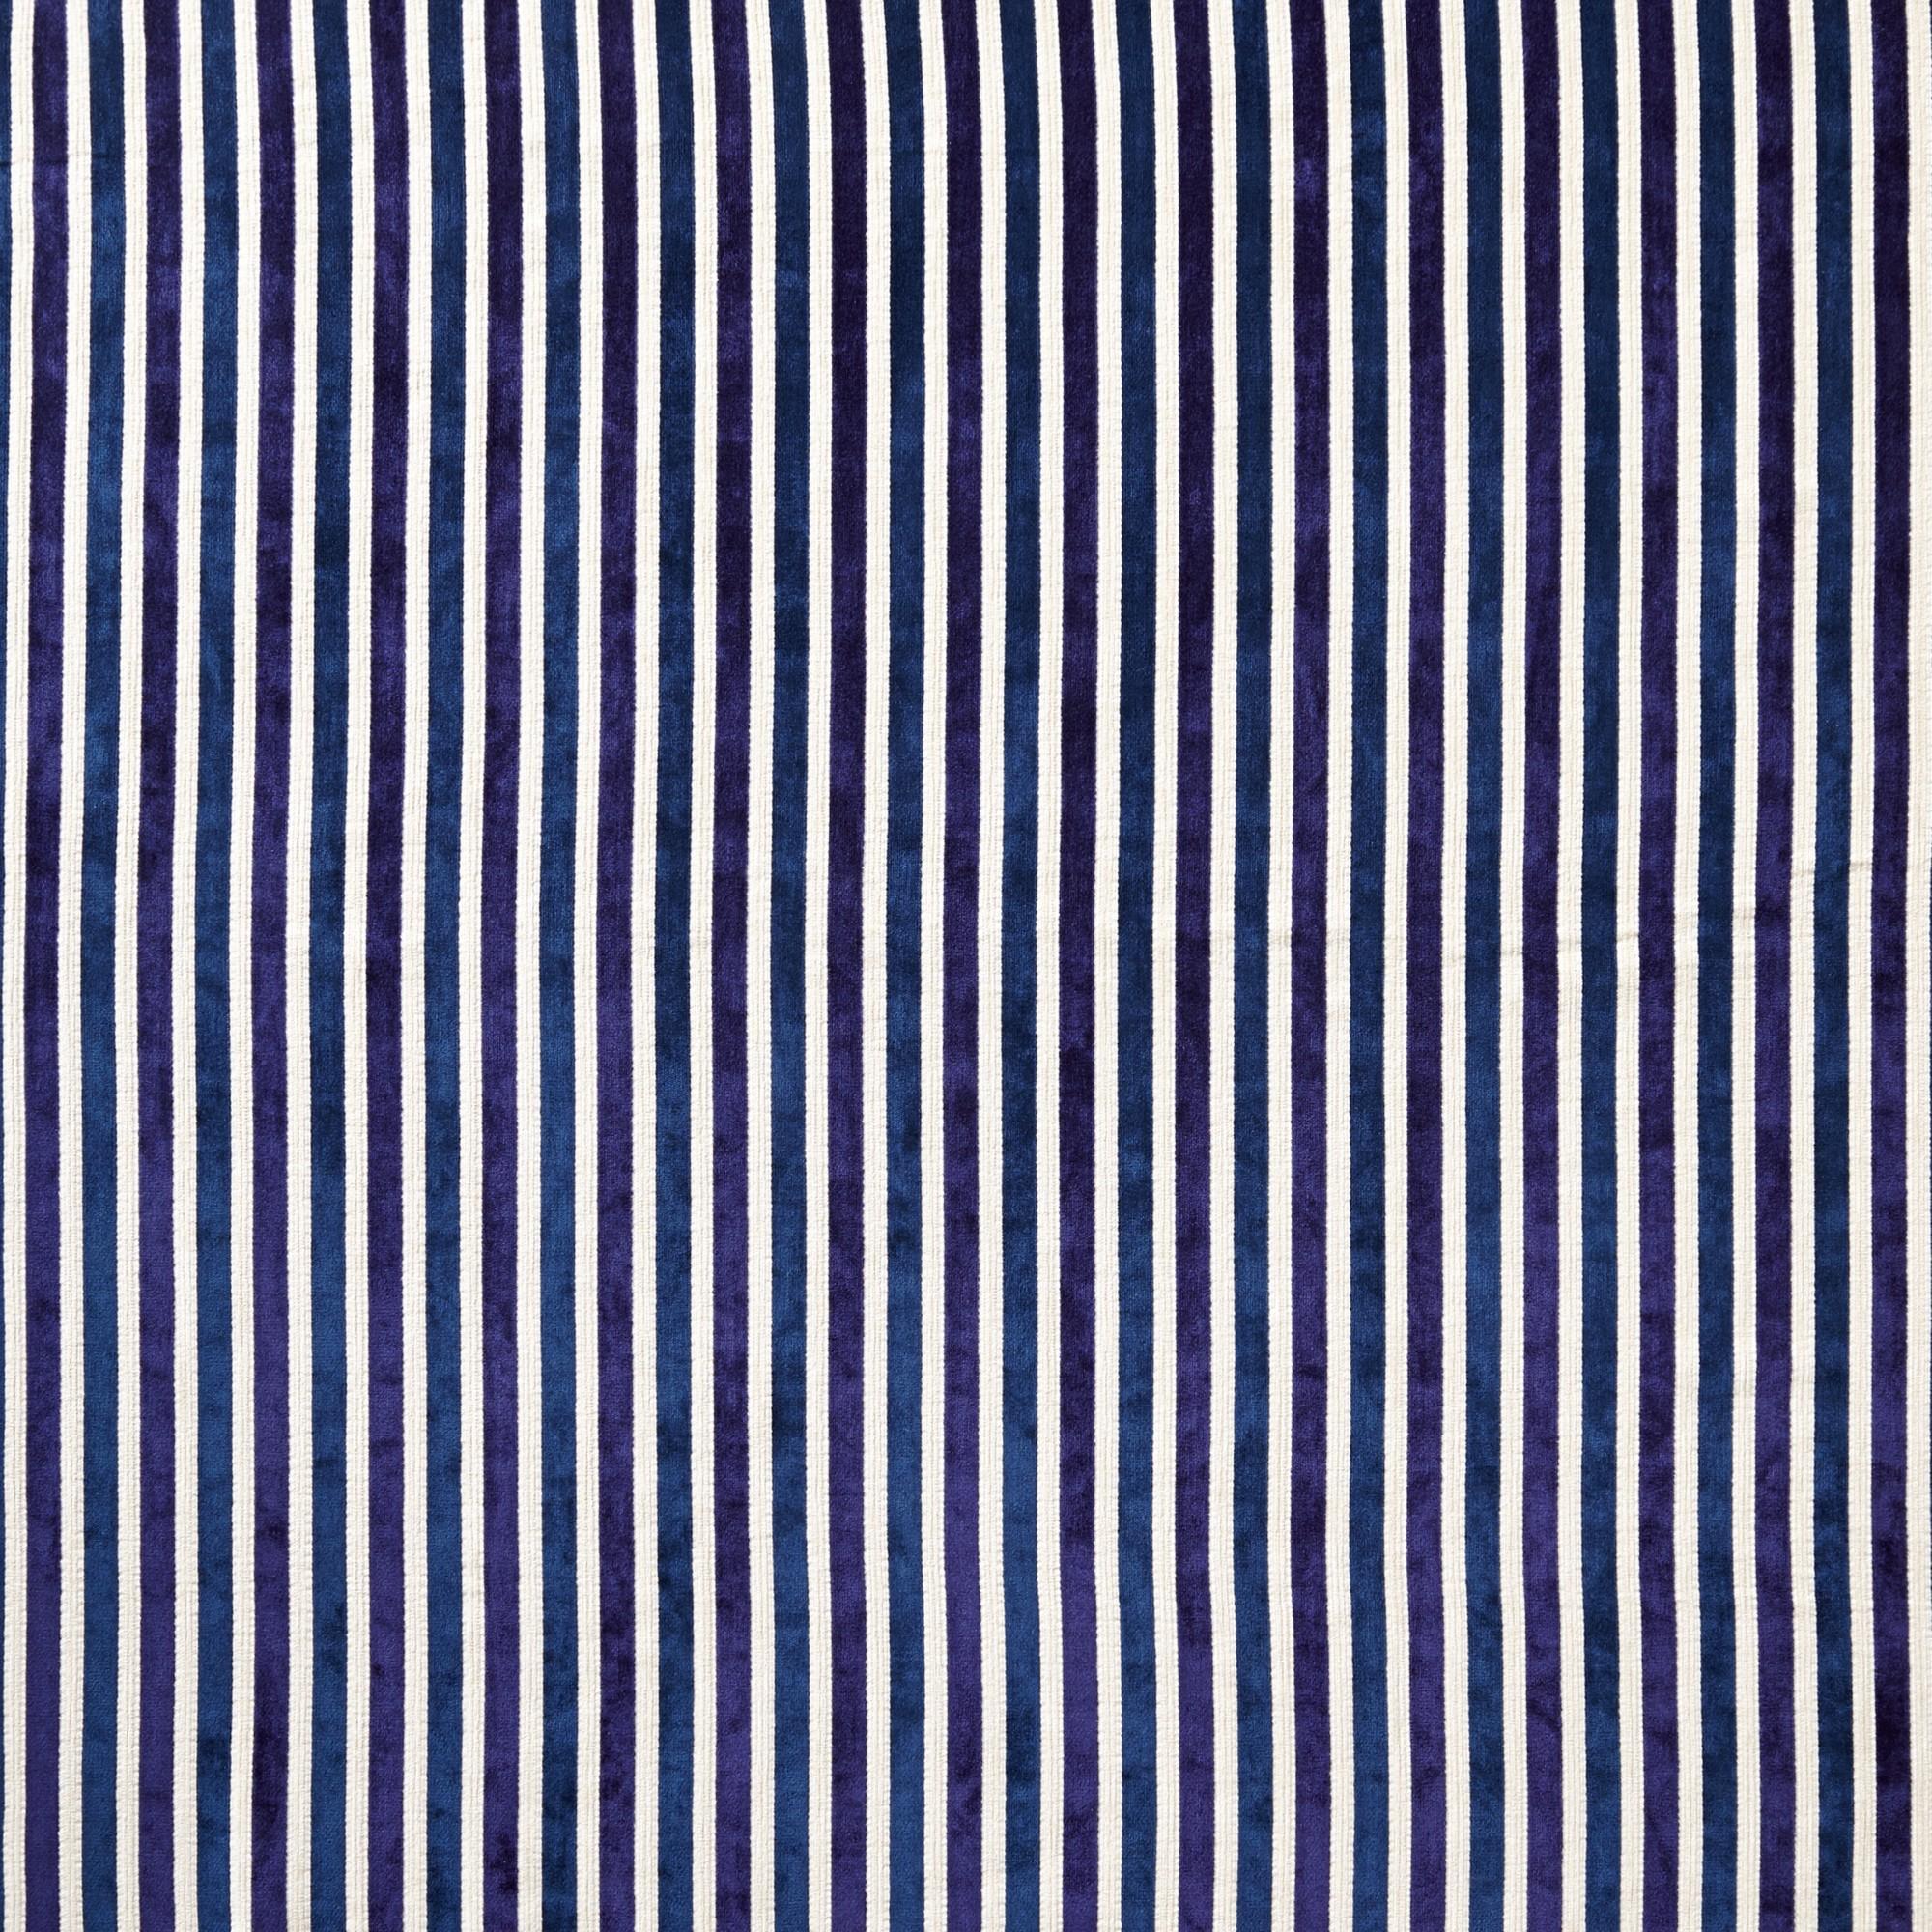 John Lewis Coffee TablesJohn Lewis Maharani Upholstered  : John Lewis Savoy Putty Woven Stripe Fabric Navy from www.bannernonprofits.com size 2000 x 2000 jpeg 1291kB